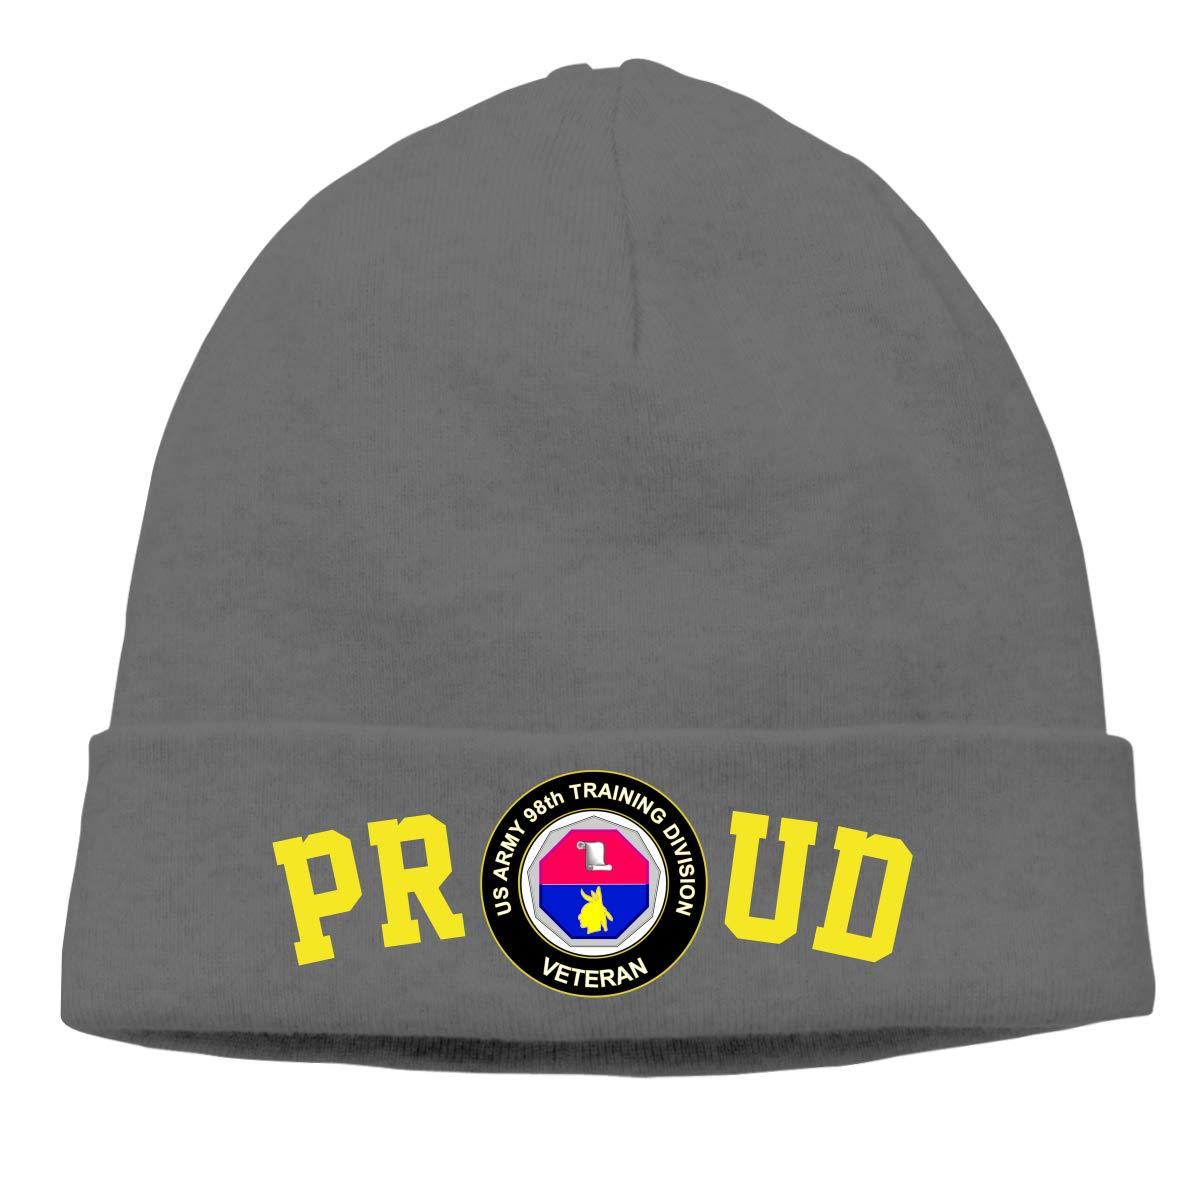 FORDSAN CP Proud US Army Veteran Training Division Mens Beanie Cap Skull Cap Winter Warm Knitting Hats.